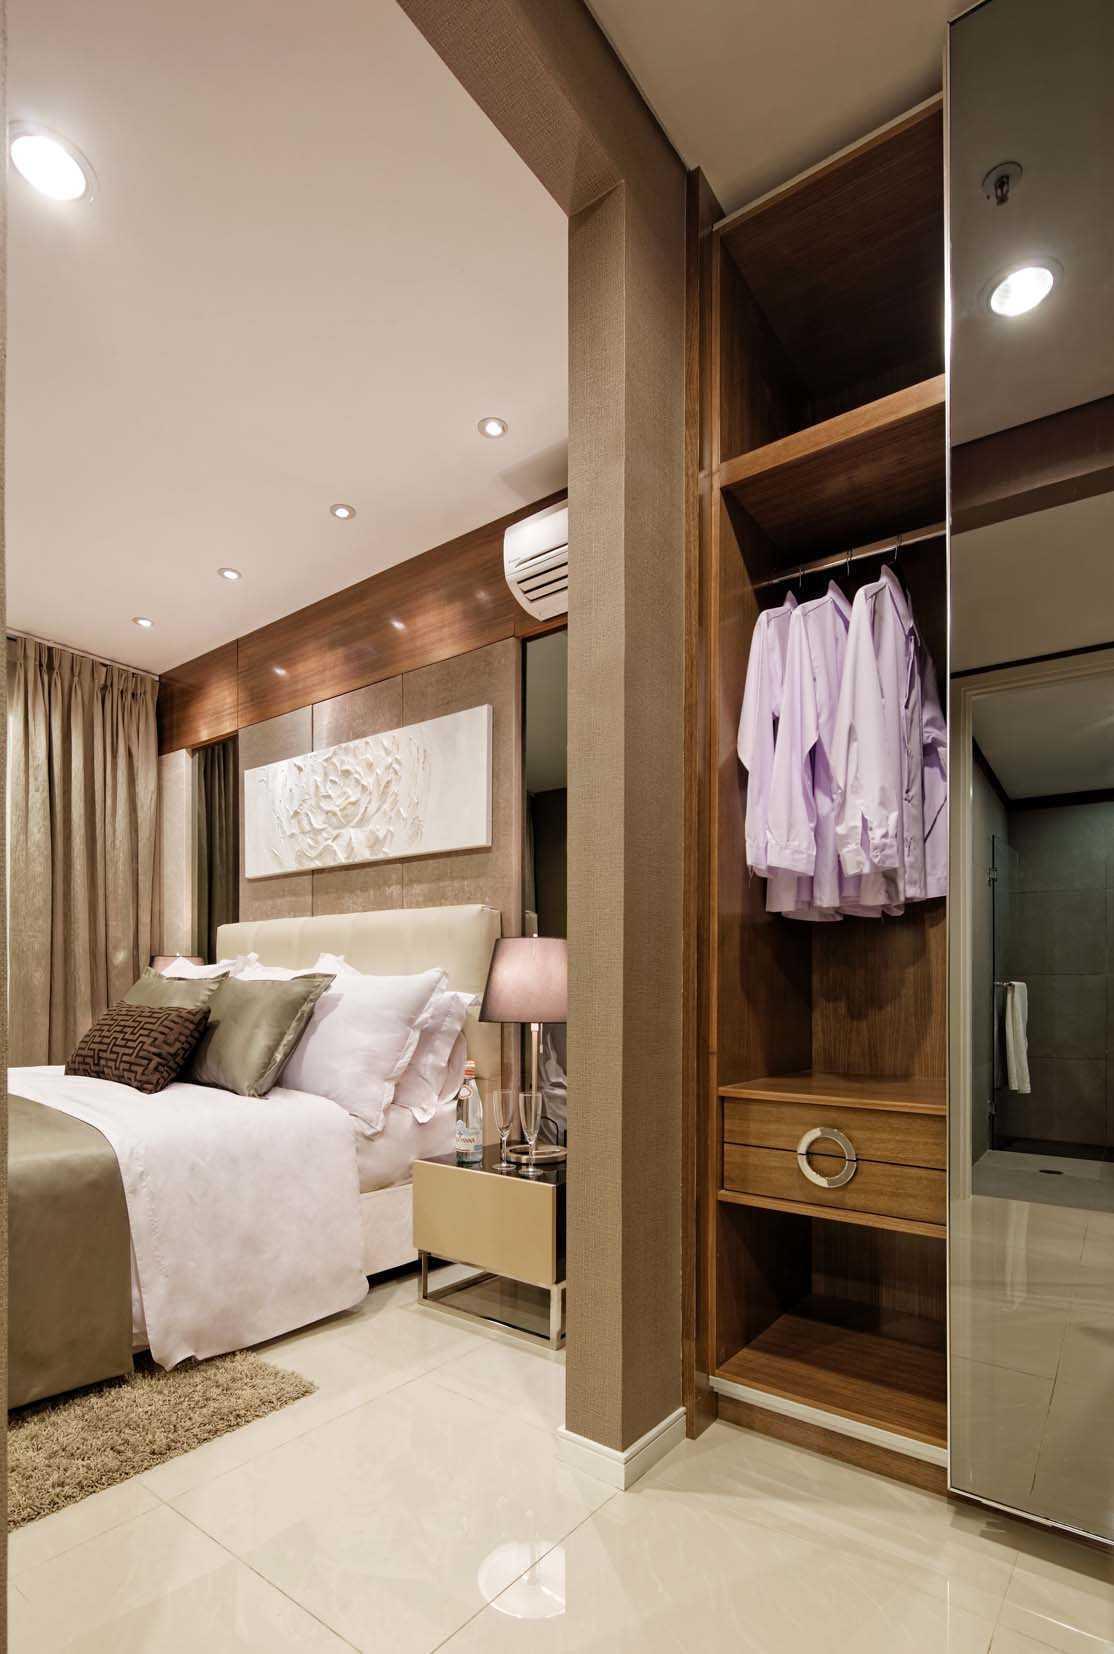 Teddykoo  3 Bedroom Loft Show Unit Paddington Height Apartment Alam Sutera  Alam Sutera  Bedroom   9639